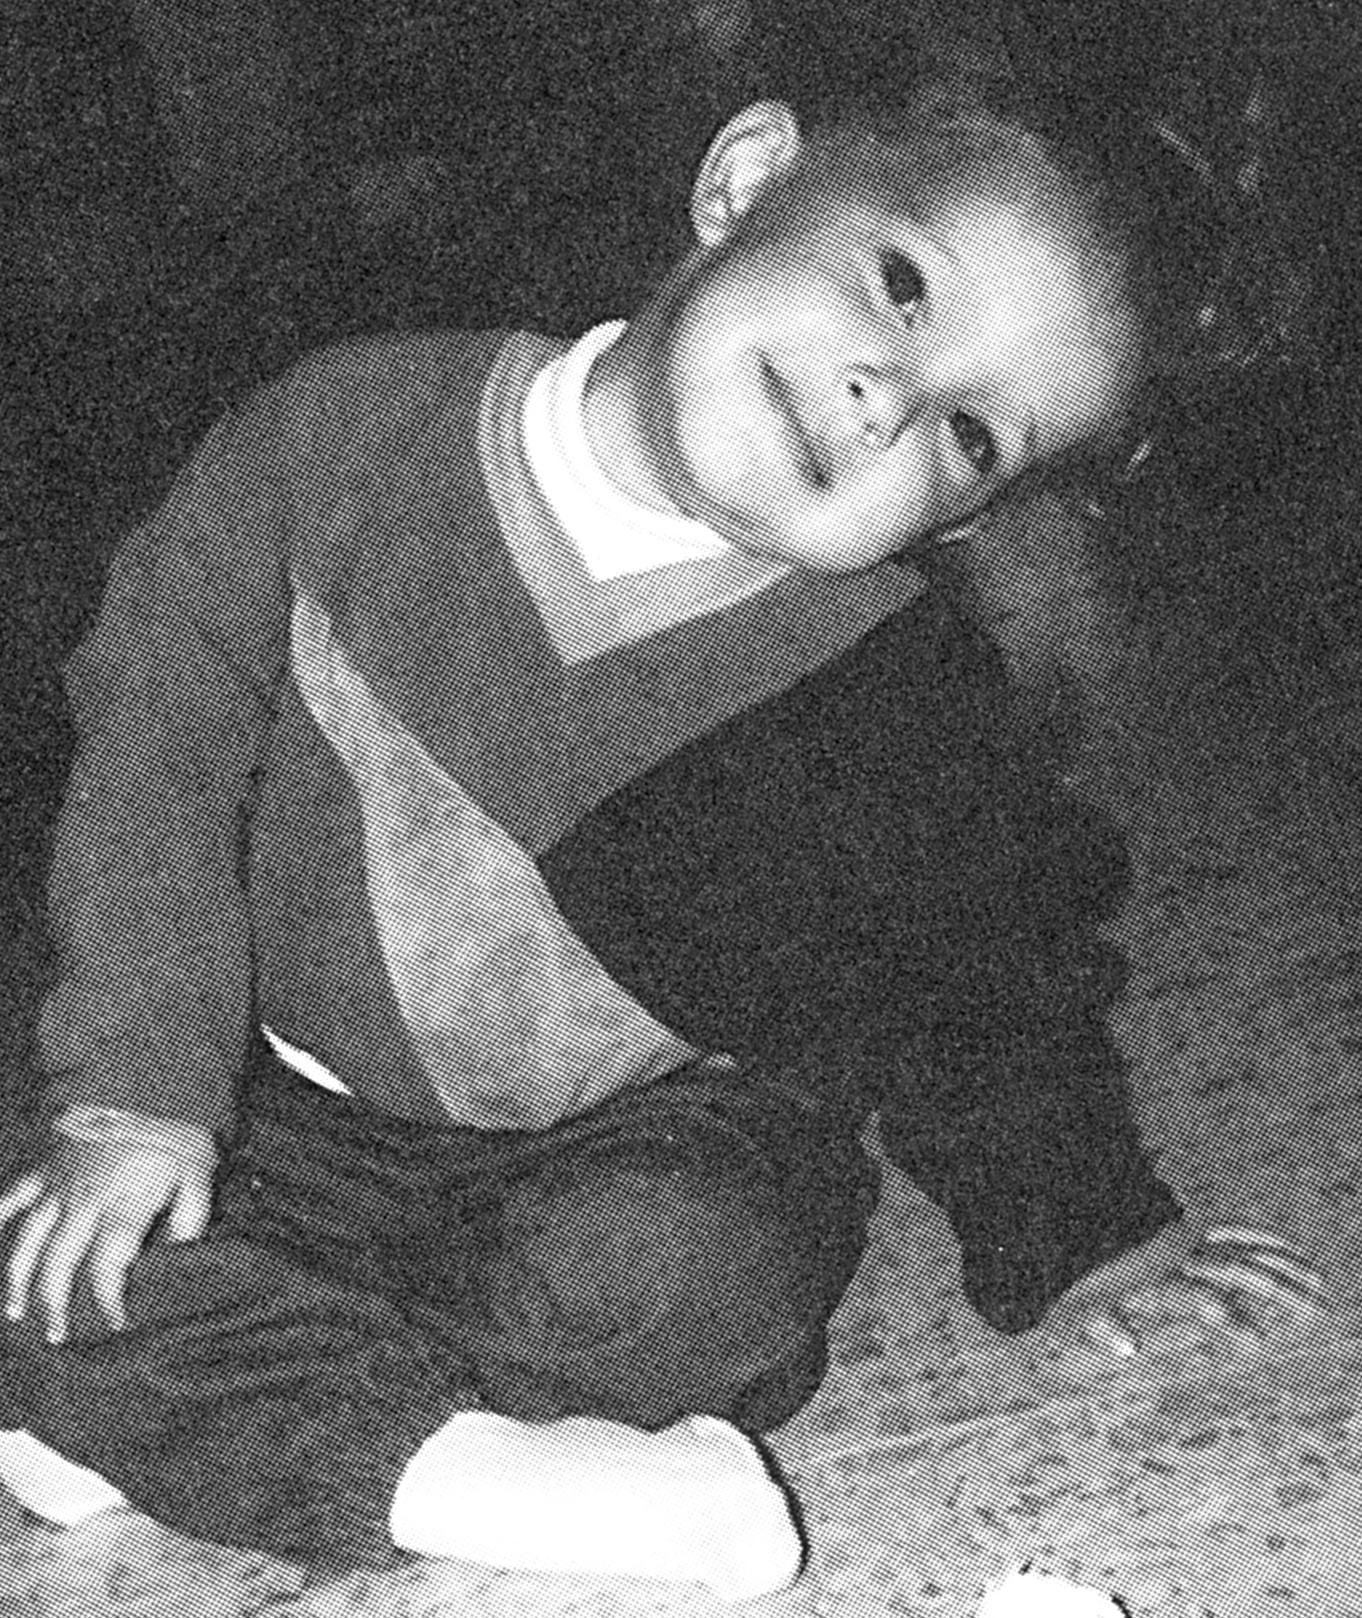 Natalie Portman baby photo